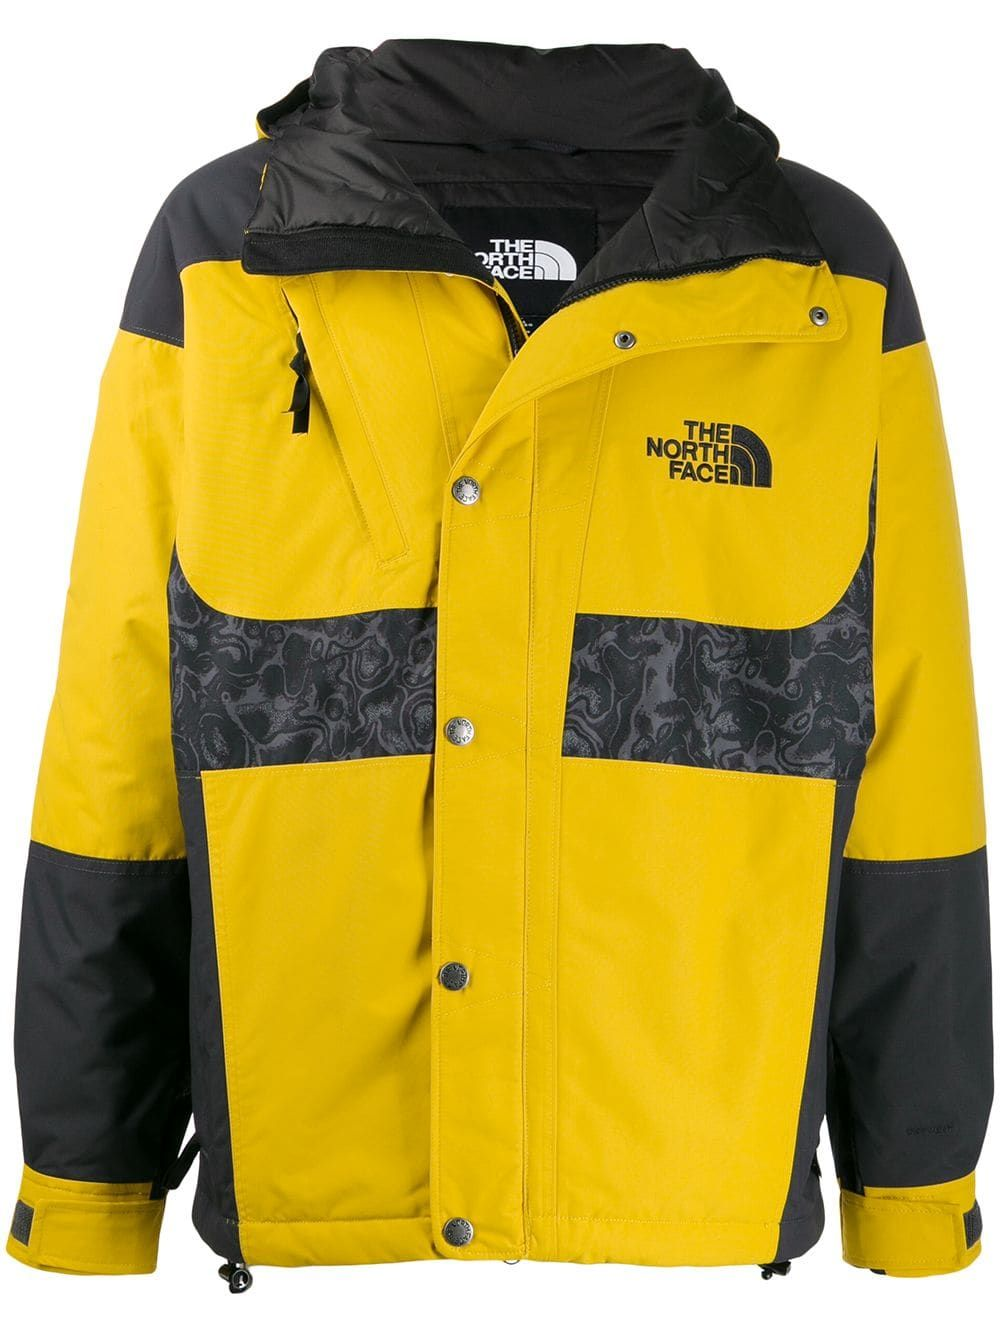 The North Face 94 Rage Jacket Farfetch Designer Jackets For Men Mens Jackets The North Face [ 1334 x 1000 Pixel ]